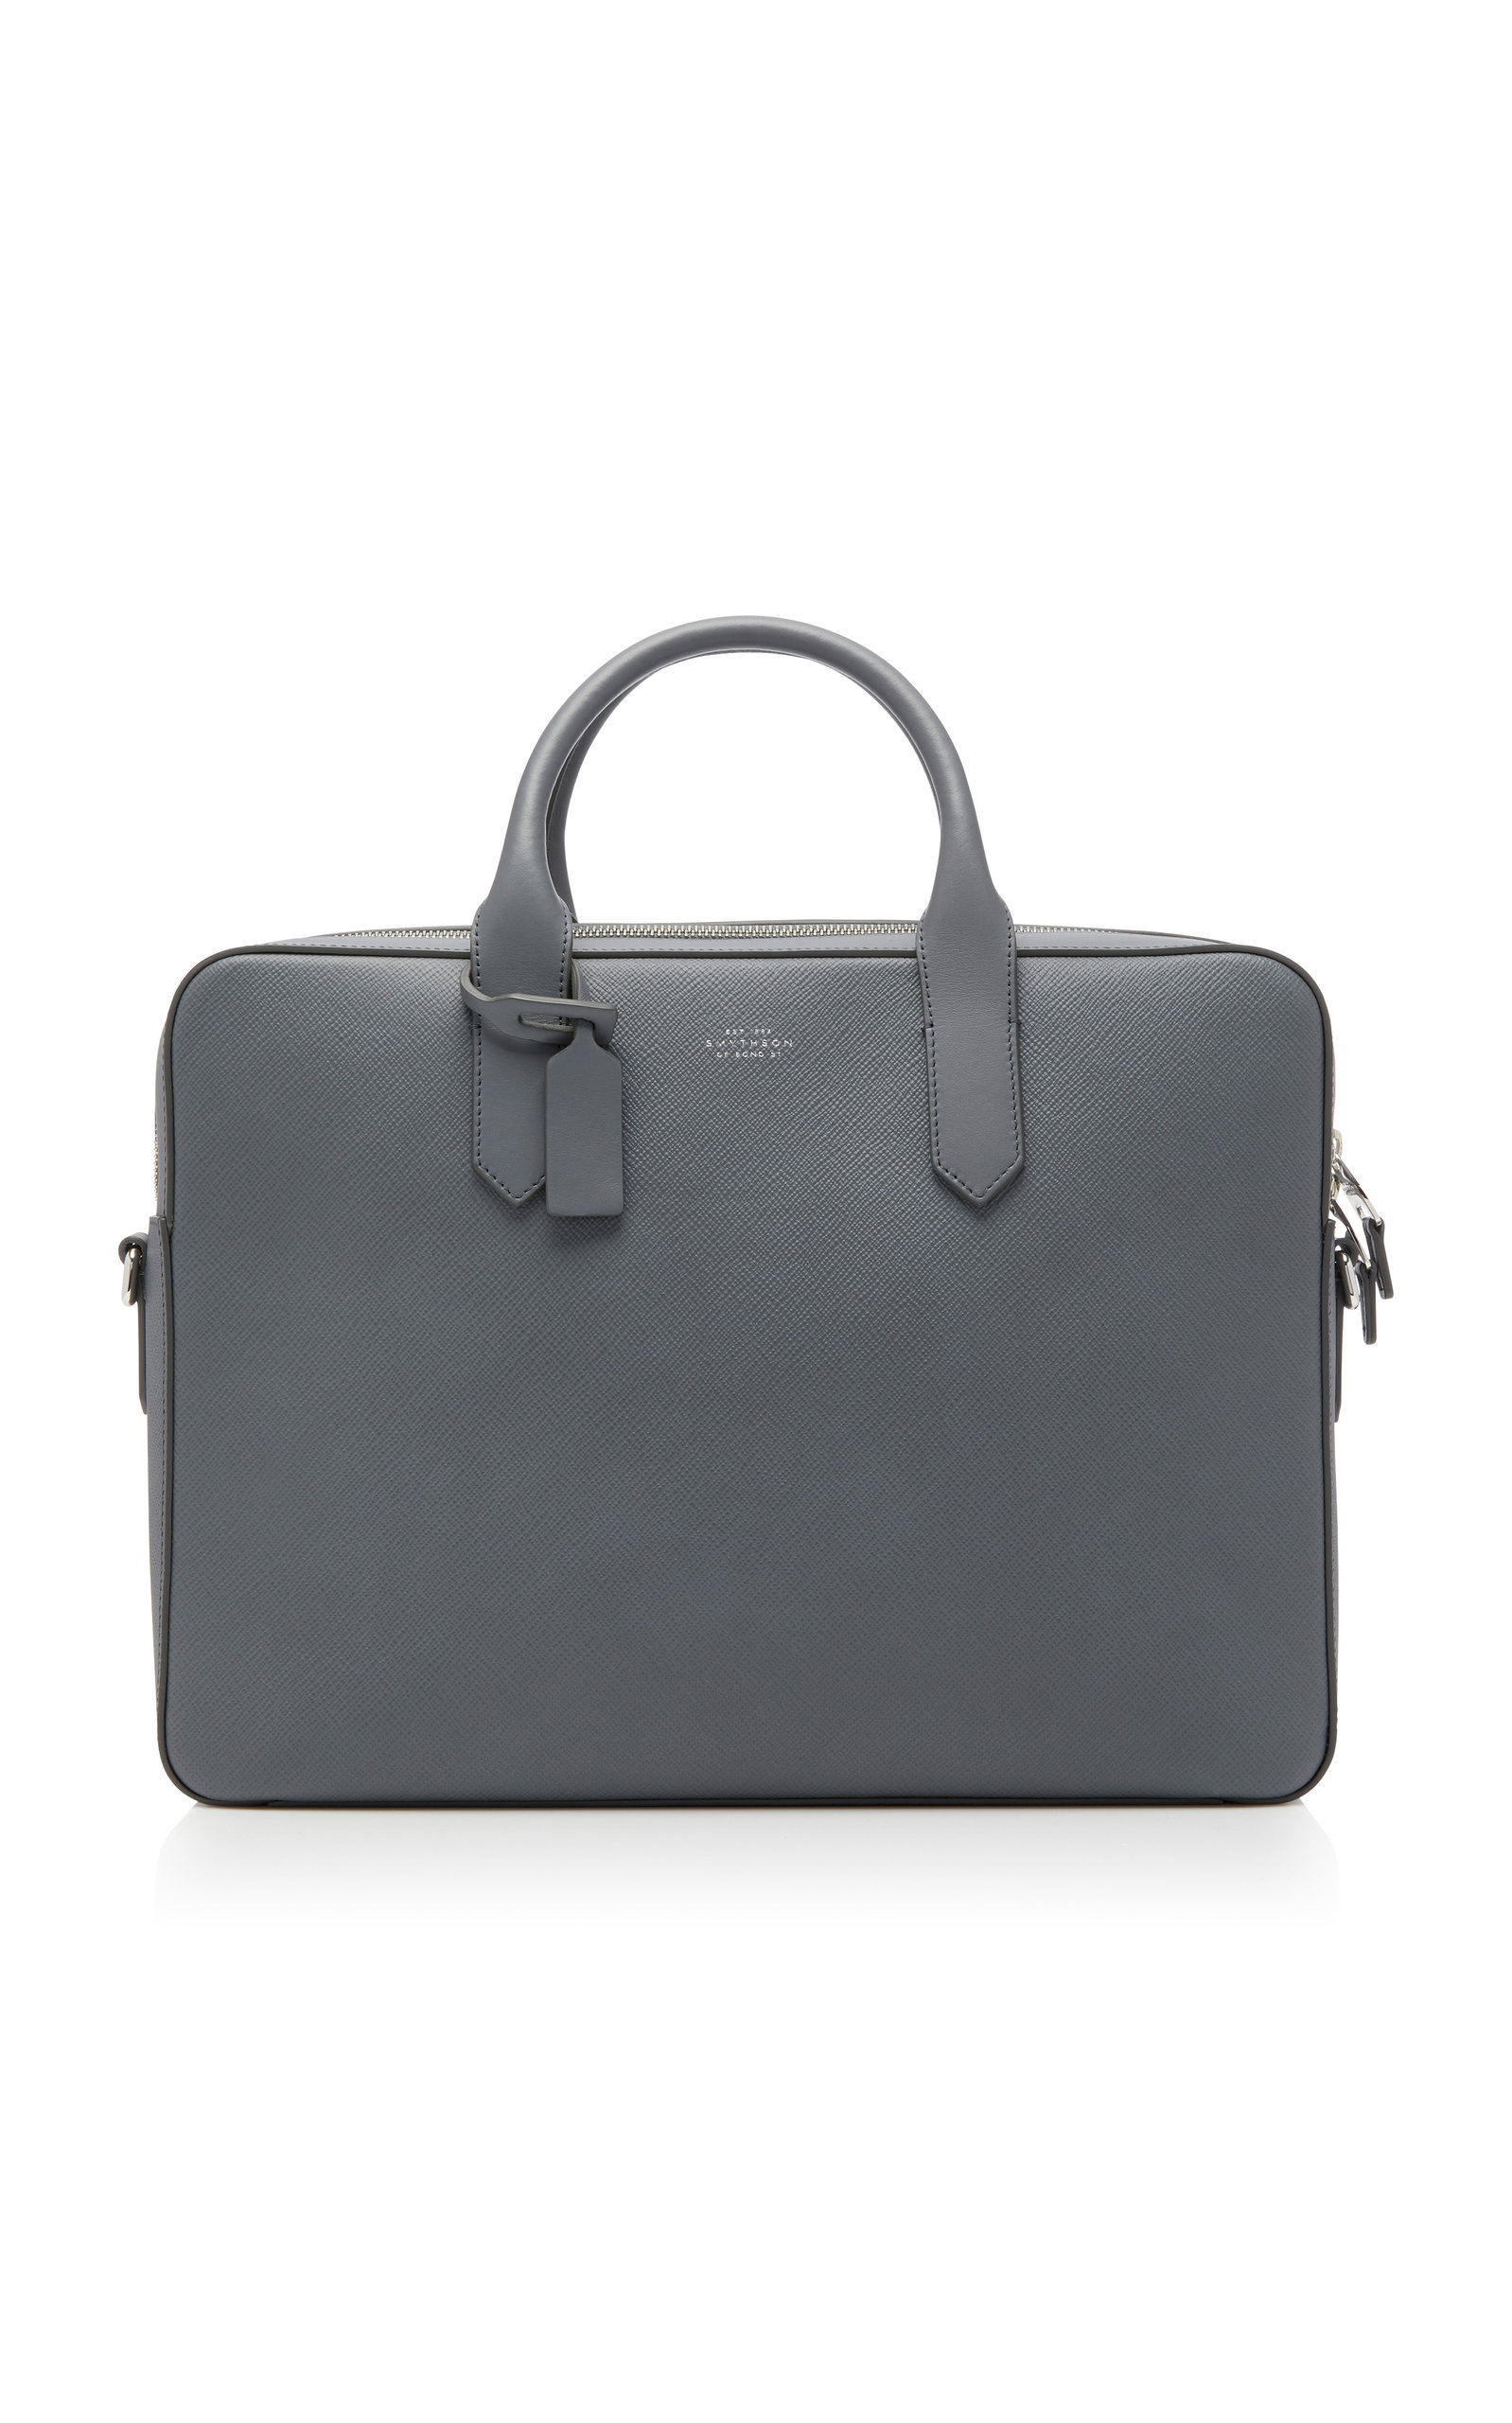 Panama leather briefcase Smythson mHOtxbN3c